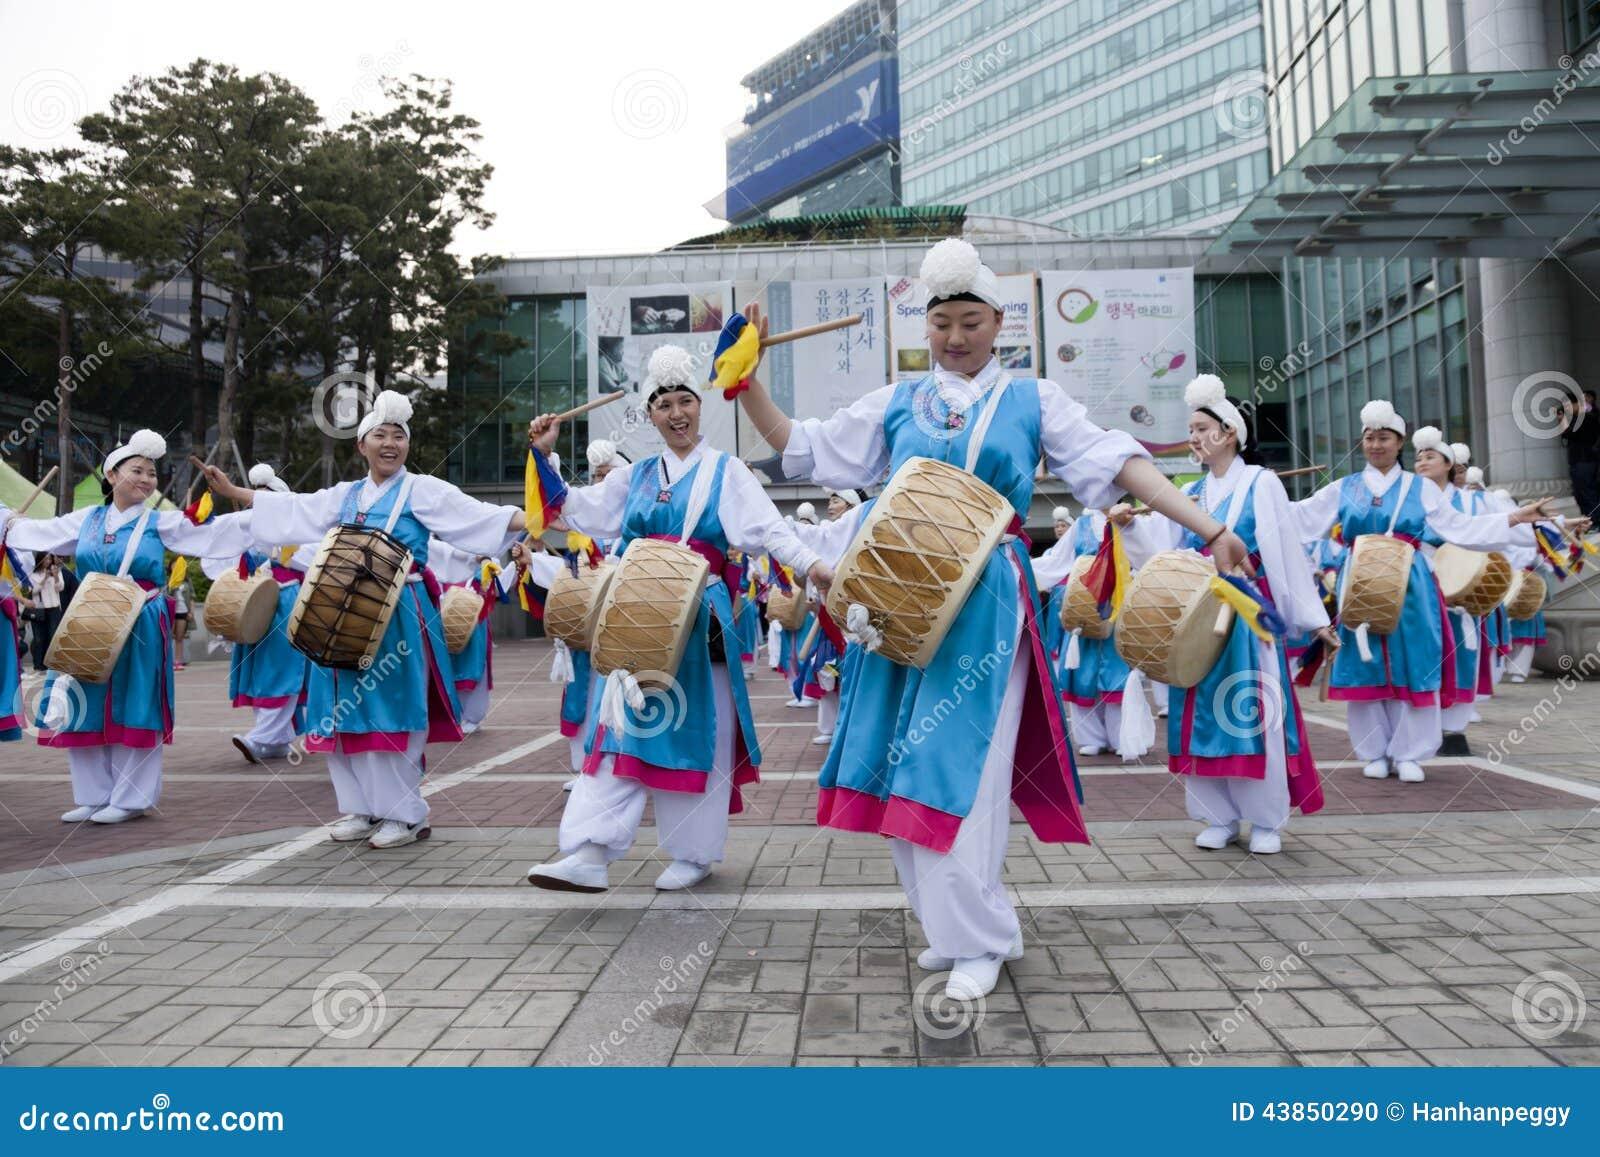 Xs Calendar May : Korean lotus lantern festival editorial image of